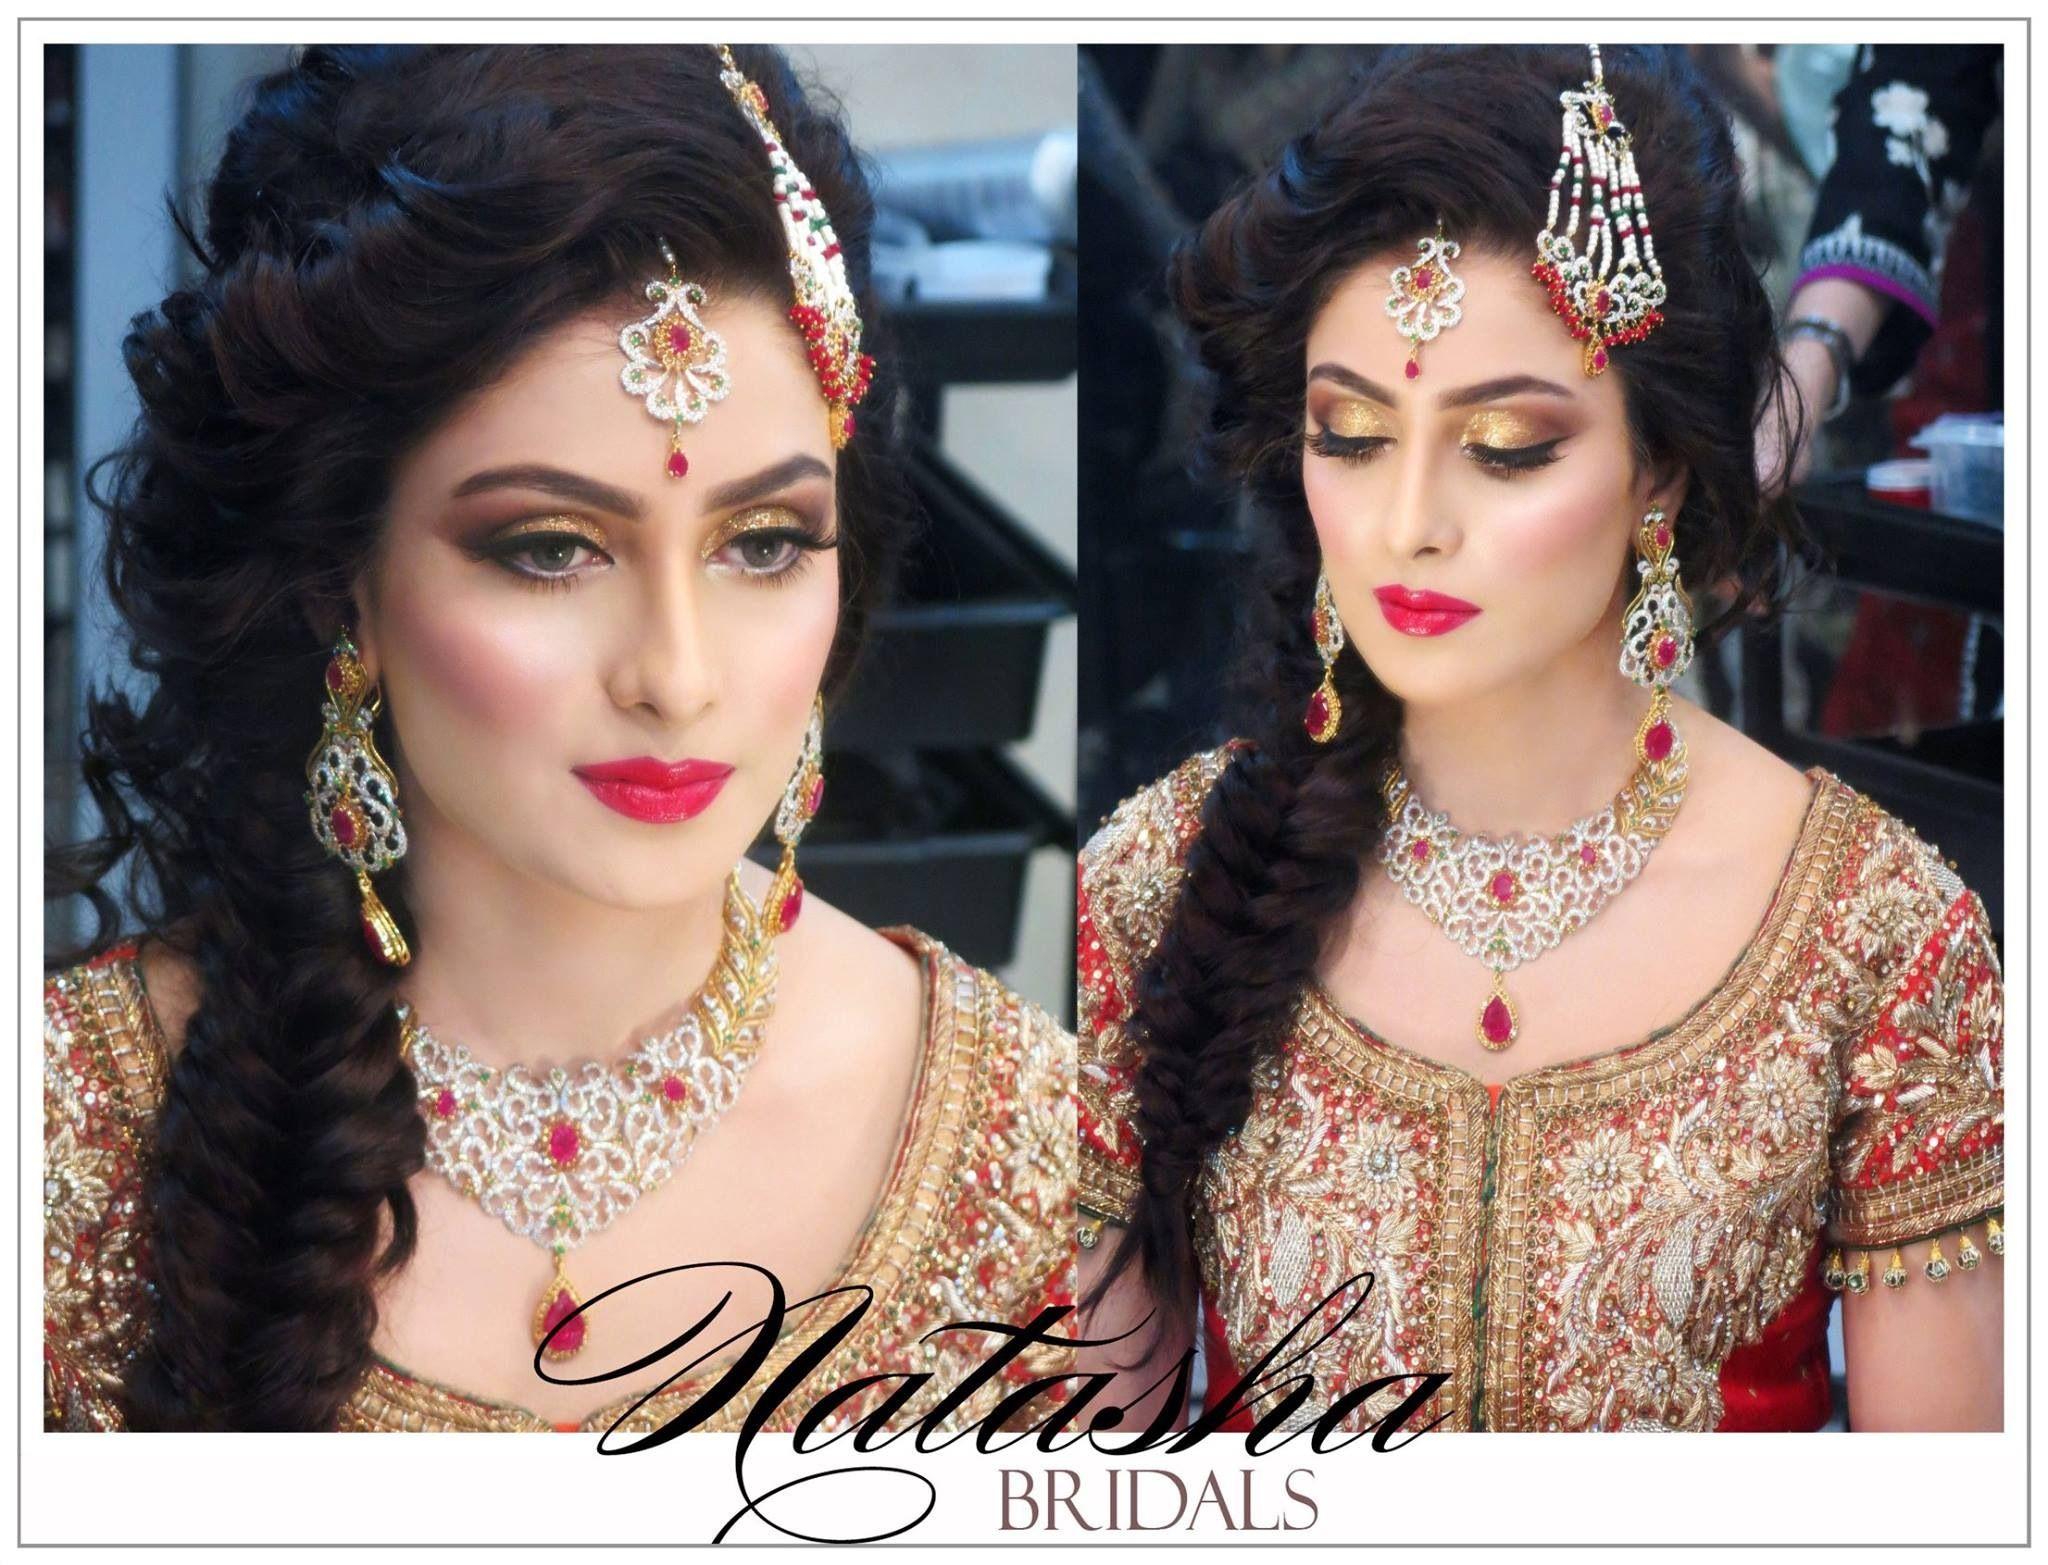 phenomenal job done by natasha salon on #ayezakhan #iheartnatasha